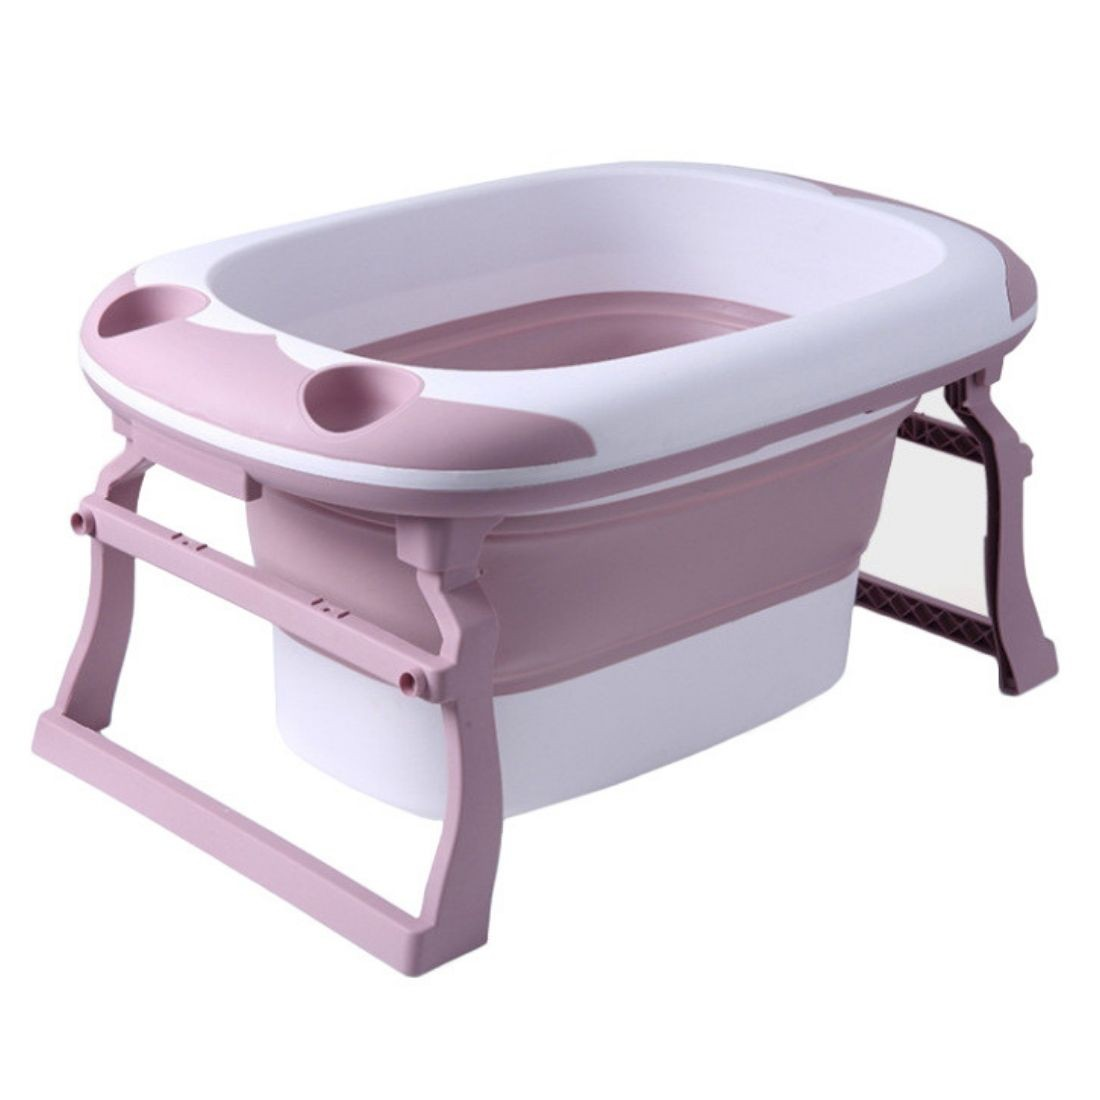 Banheira Ofurô Dobrável Flexi Grande Bebê Infantil 80L Rosa